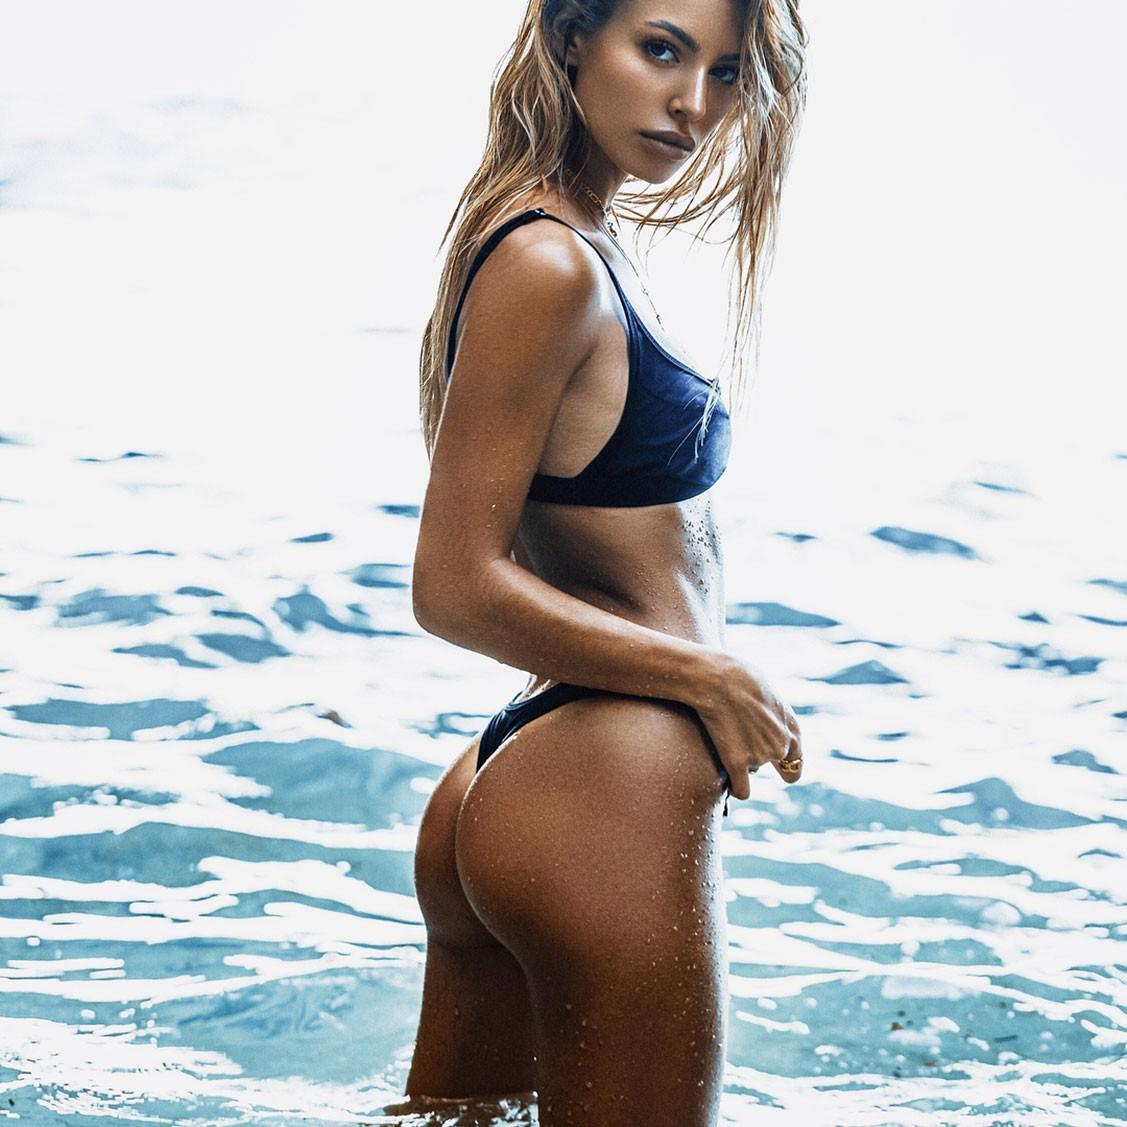 Jessica Goicoechea by Kesler Tran - Fae Swim spring-summer 2018 / Deseo